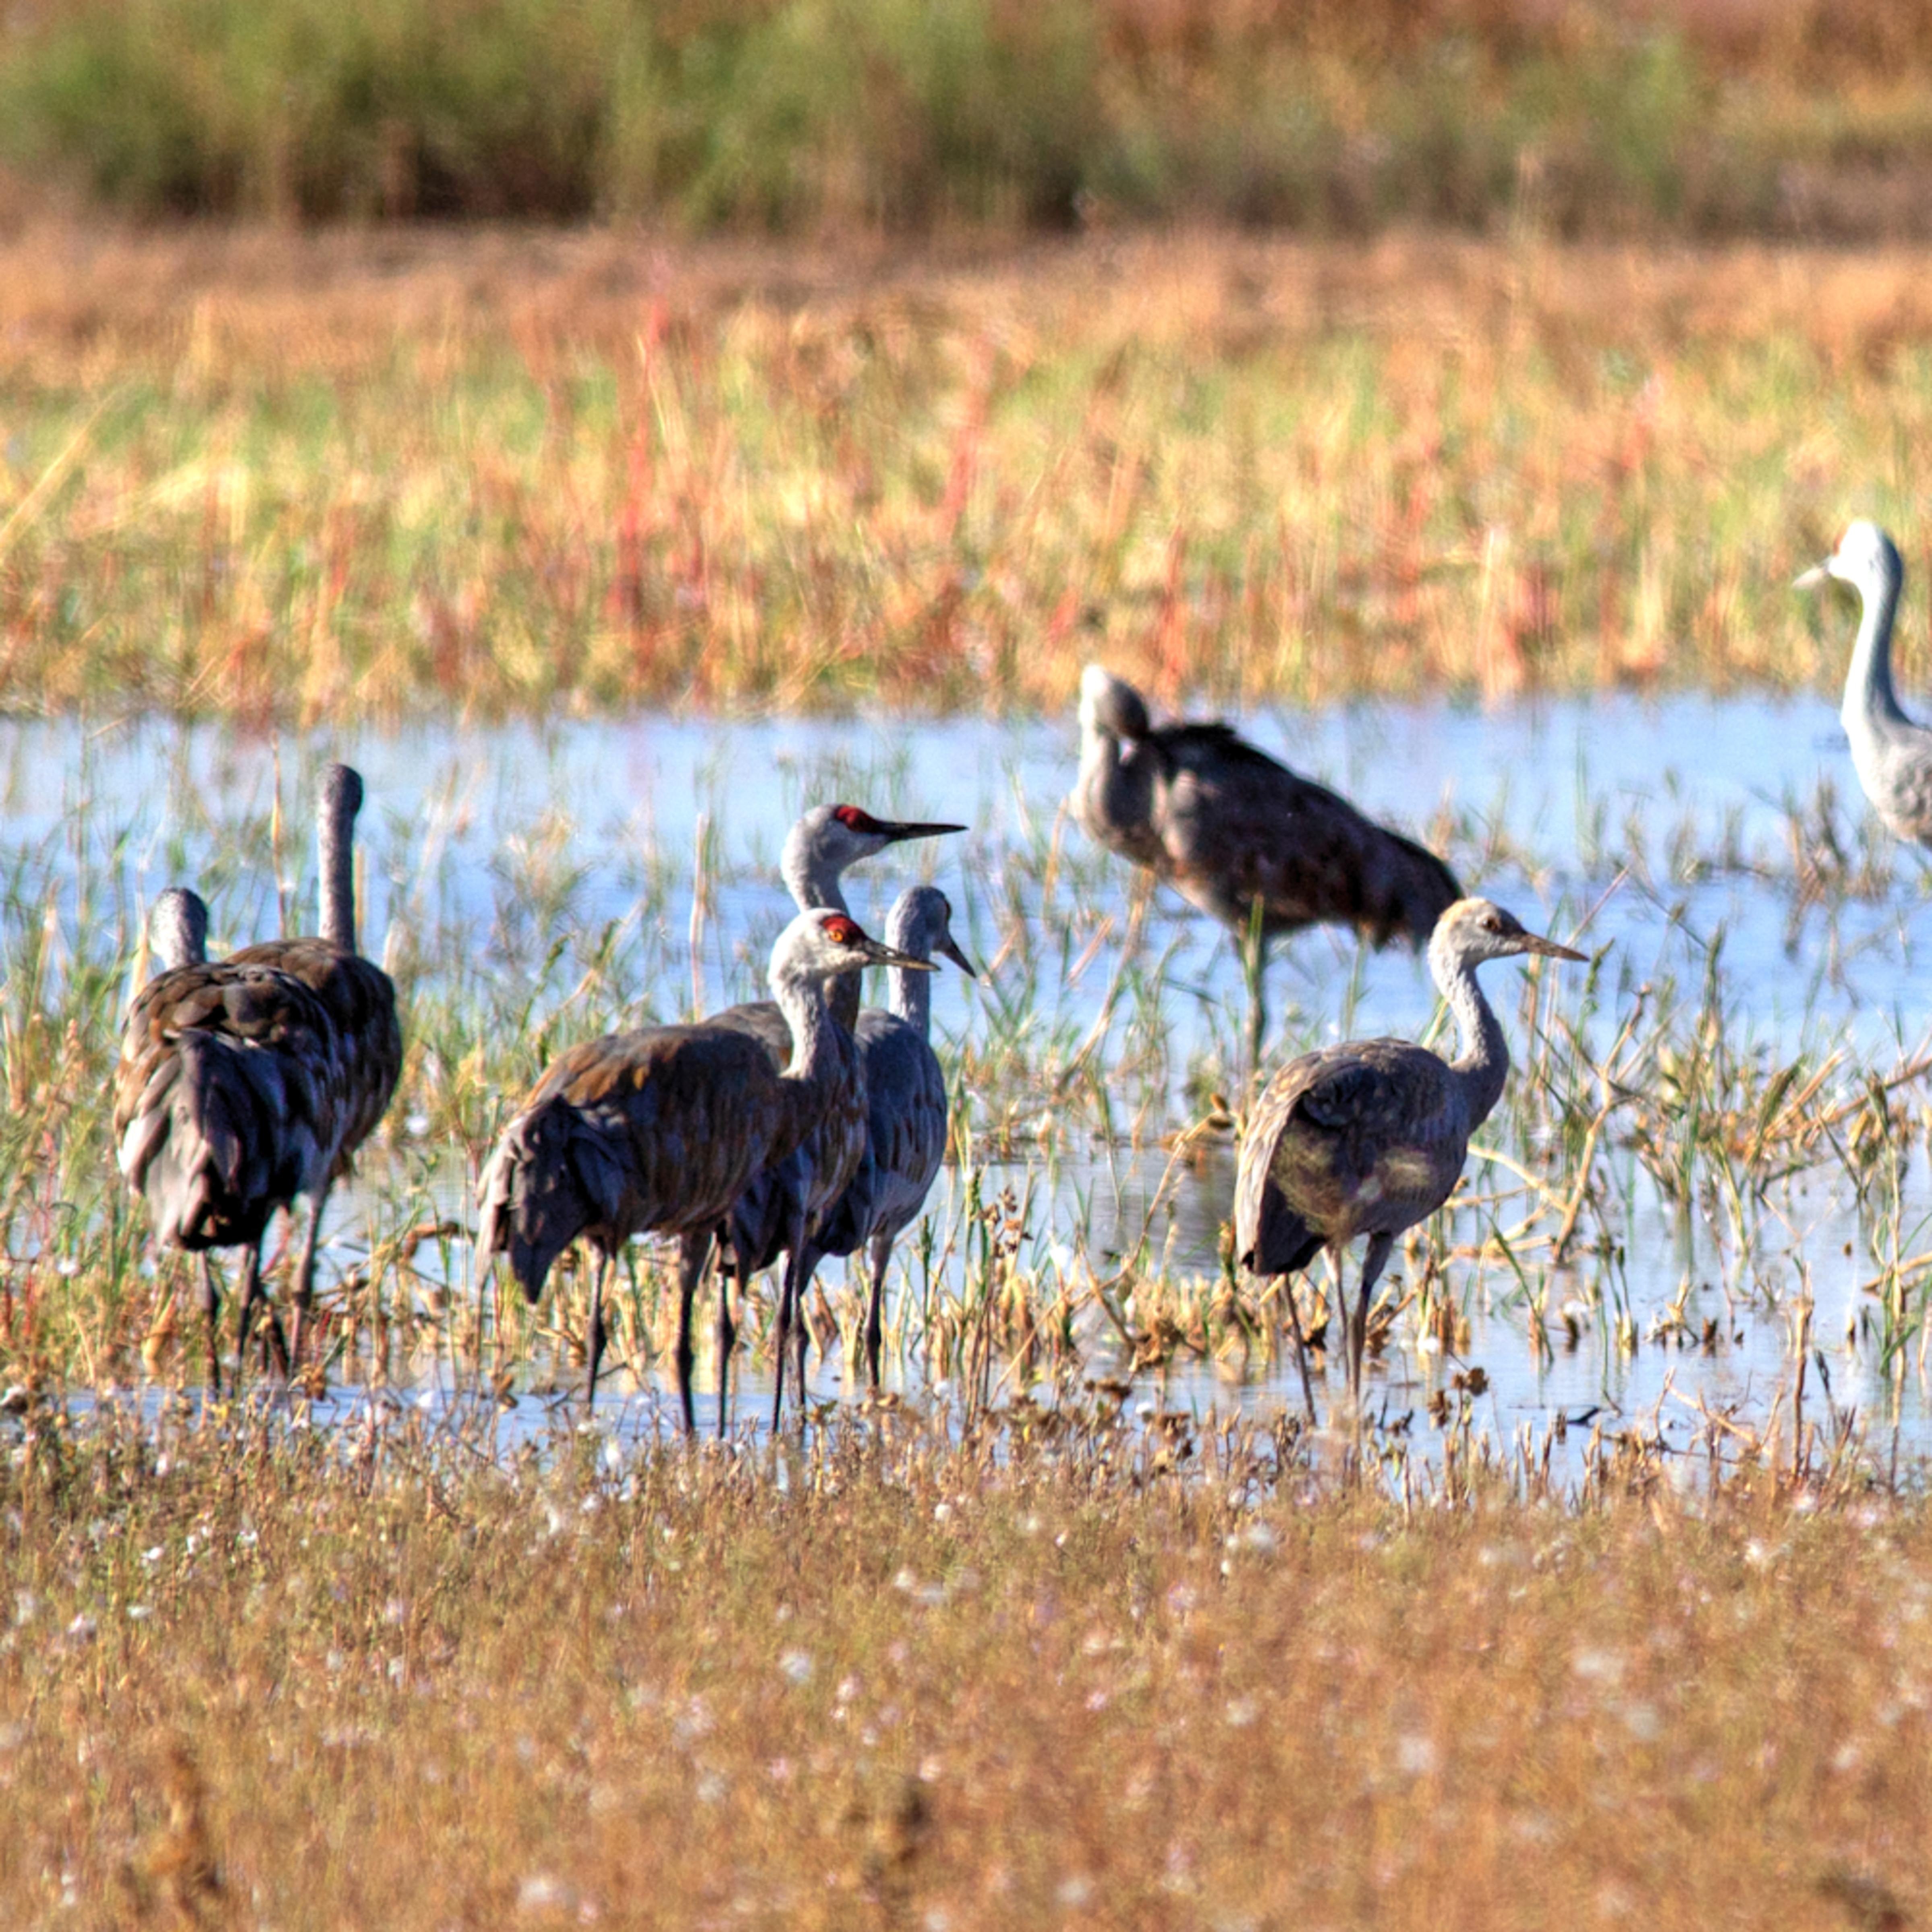 Cranes at whitewater draw u9nu6n